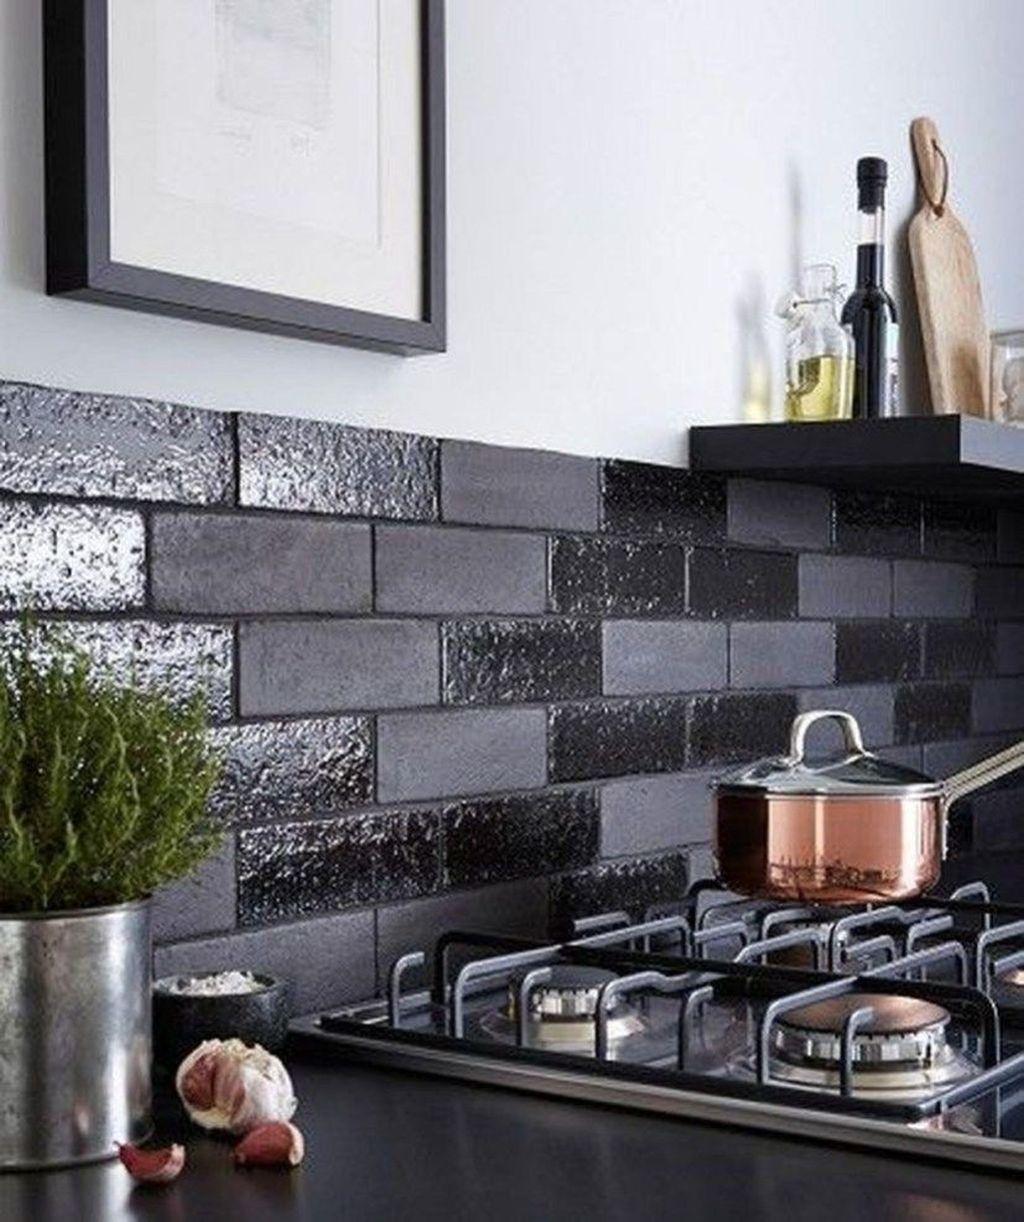 Extraordinary Black Backsplash Kitchen Design Ideas That You Should Try 37